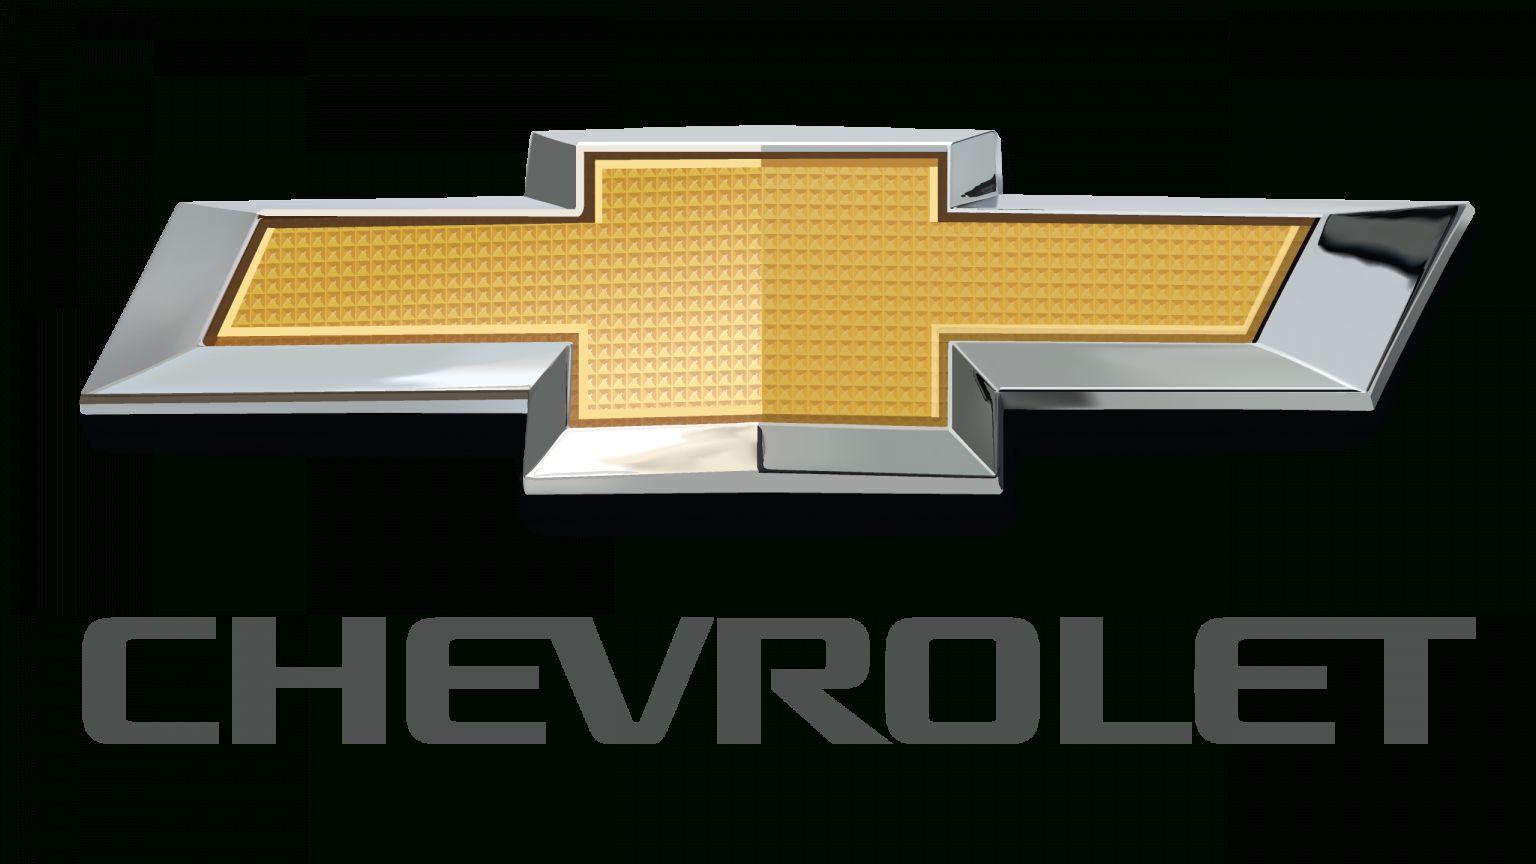 18 Chevrolet Logo Png Car Brands Logos Chevrolet Logo Ford Logo